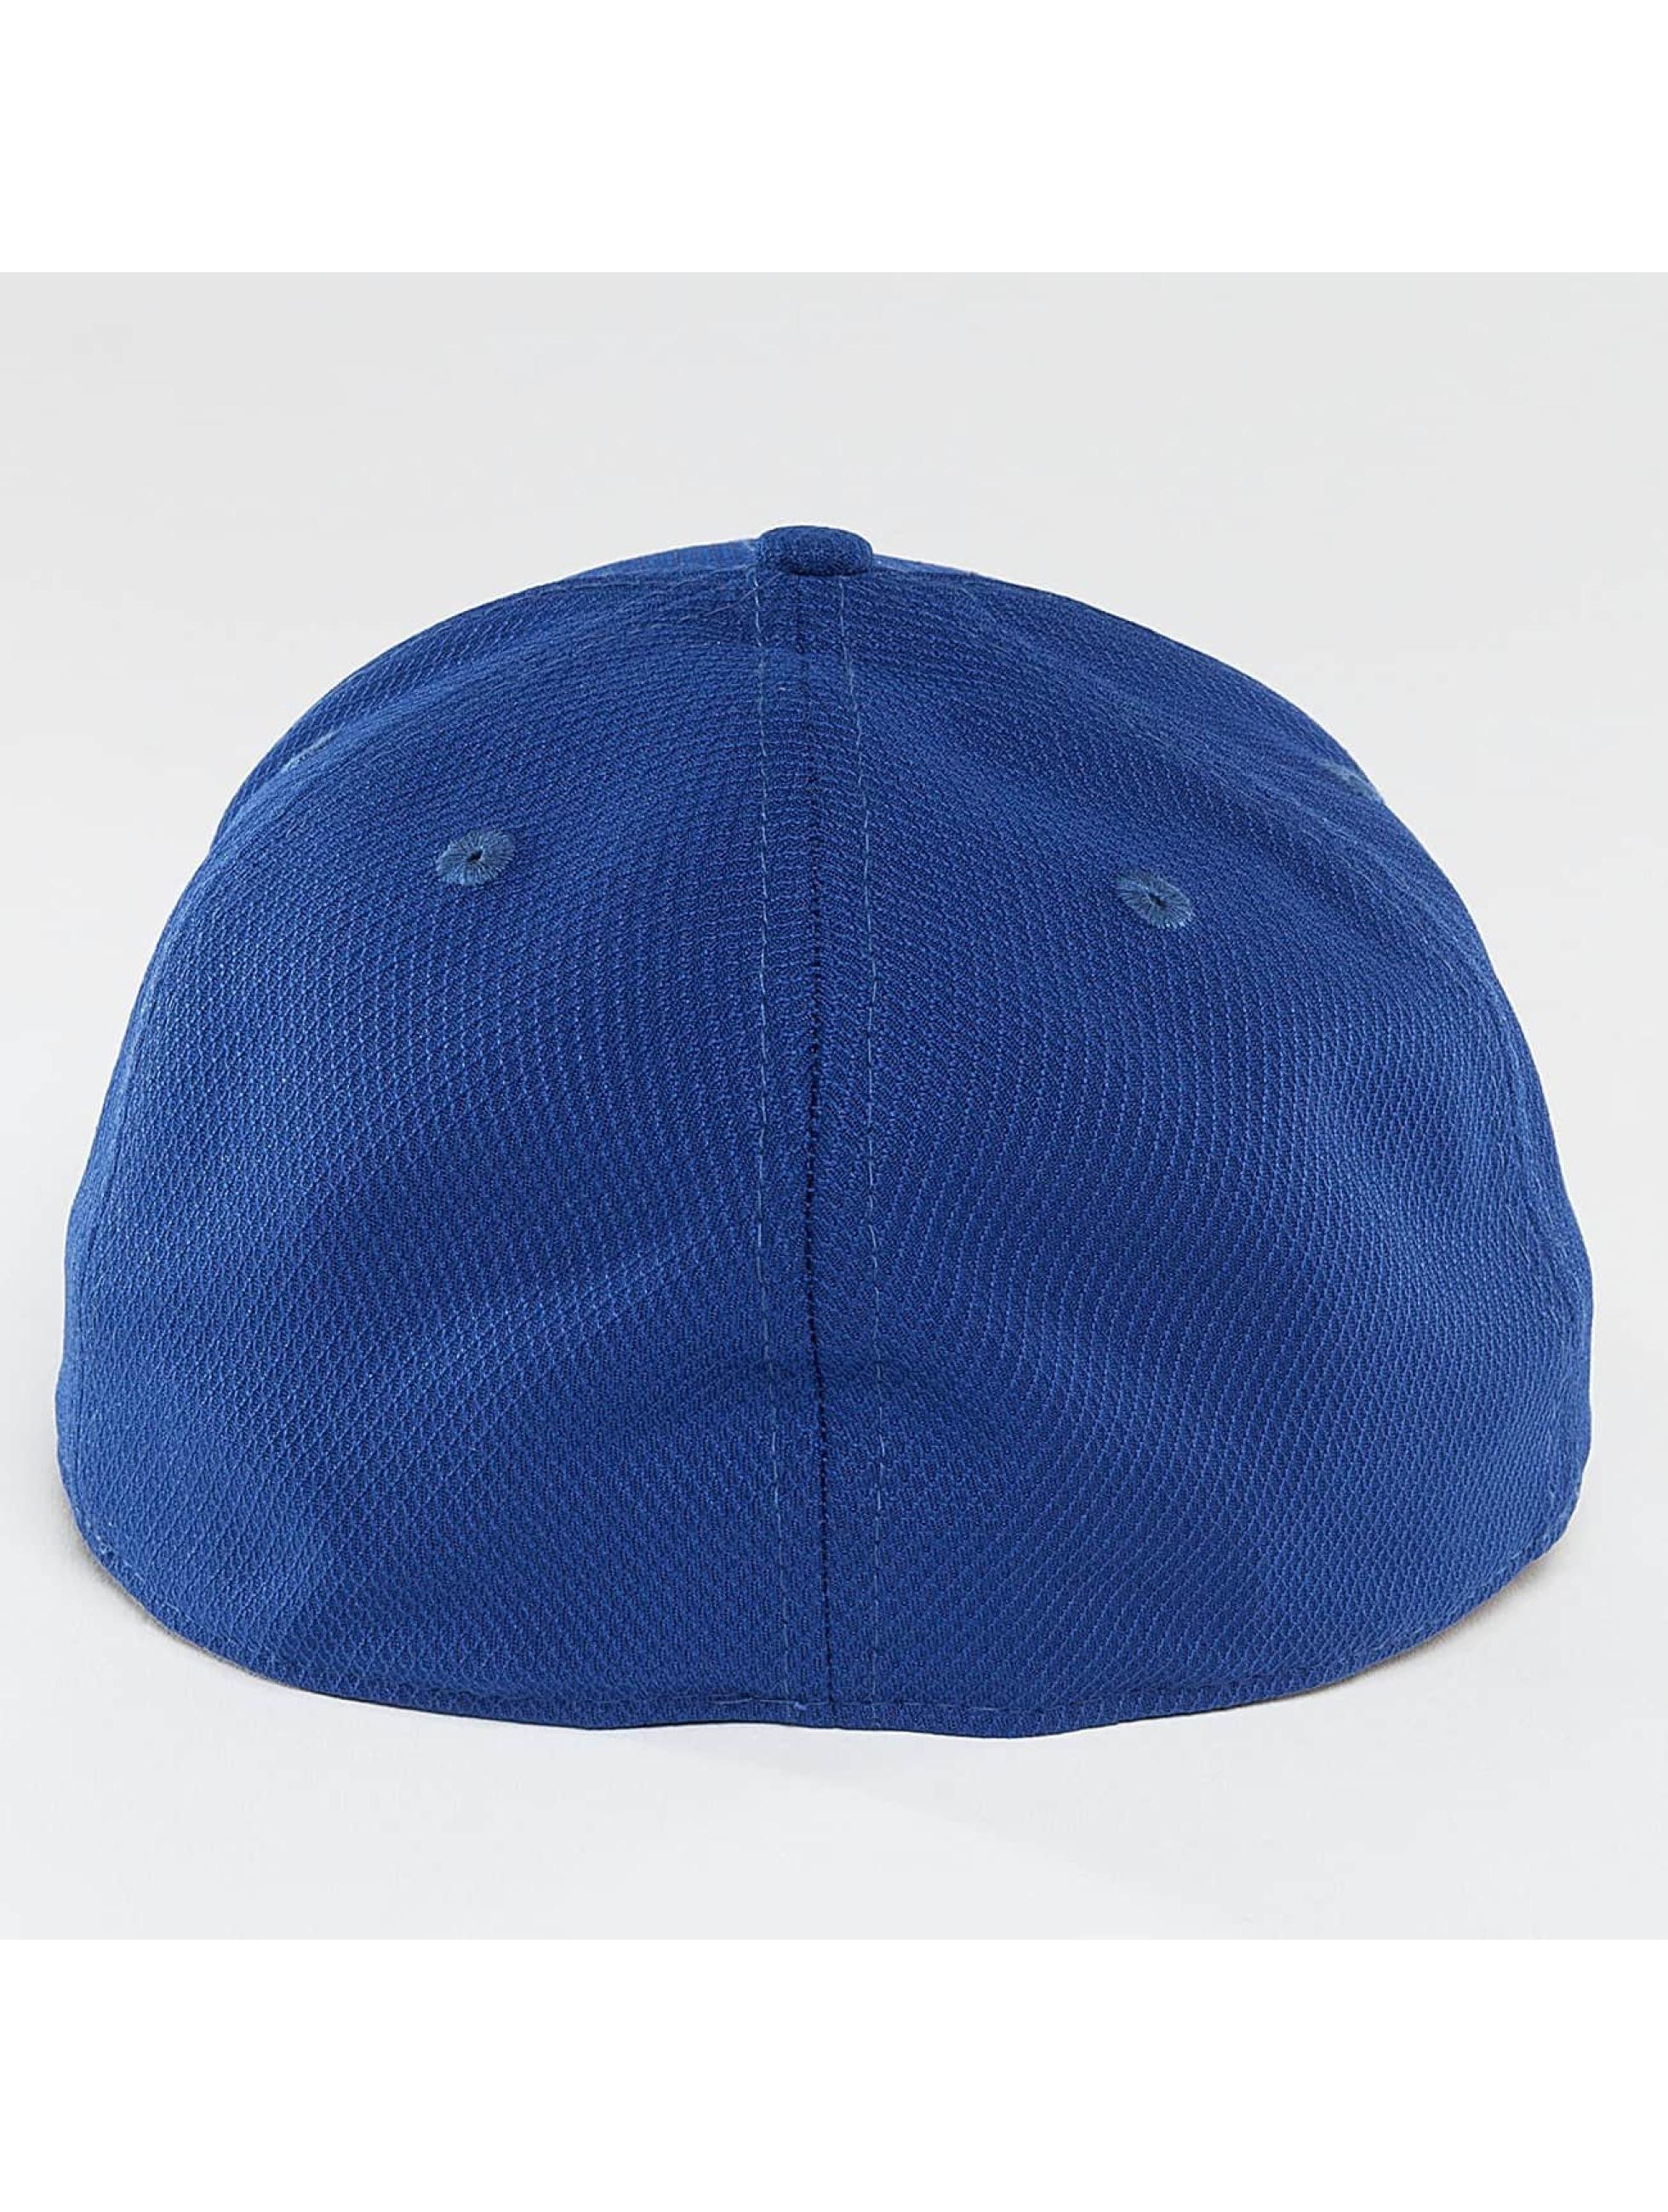 New Era Fitted Cap Diamond Era Essential LA Dodgers 59Fifty blue